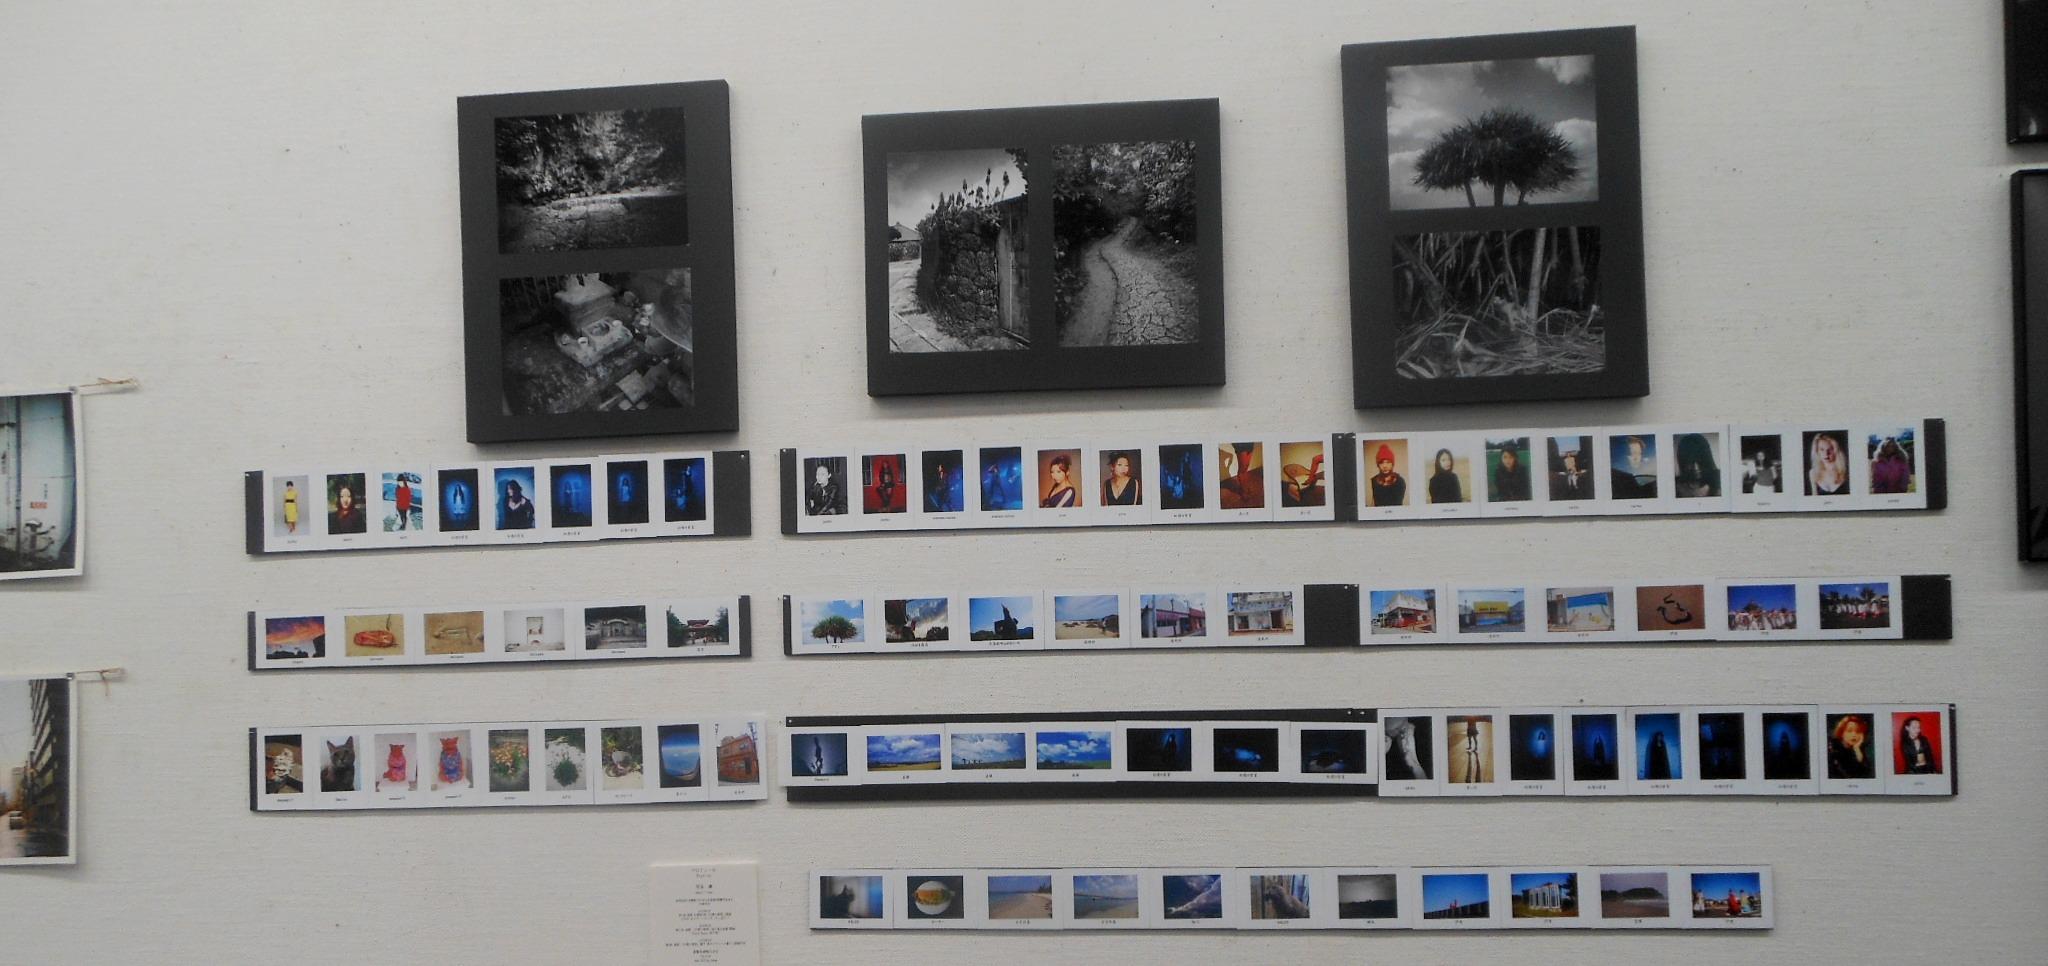 1885)②「写真クラブ「BePHaT!!」 第9回作品展 『夢 Photo 2012』」市民g. 終了11月21日(水)~11月25日(日)_f0126829_23215972.jpg